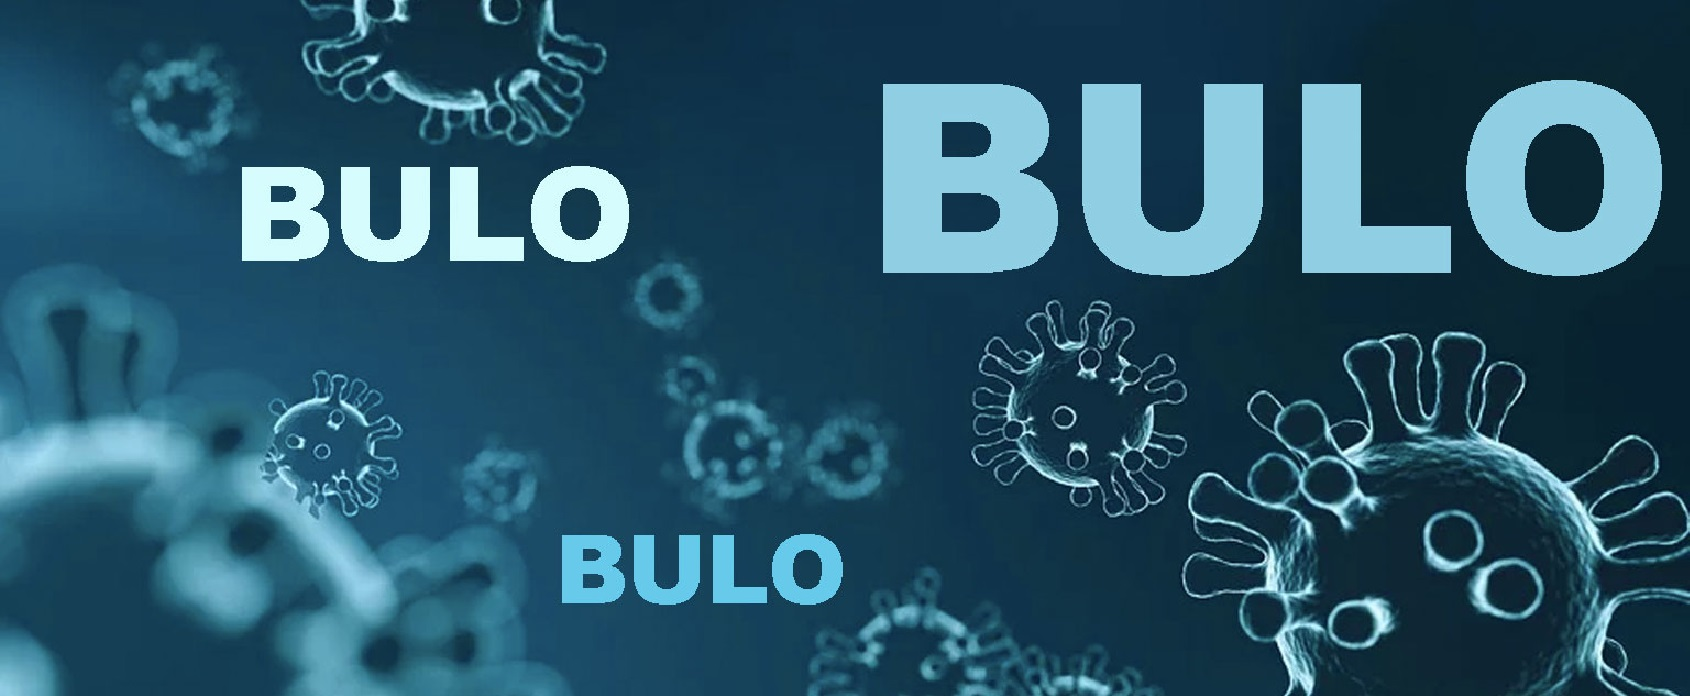 https://maldita.es/app/uploads/2020/02/bulos-coronavirus-1.jpg